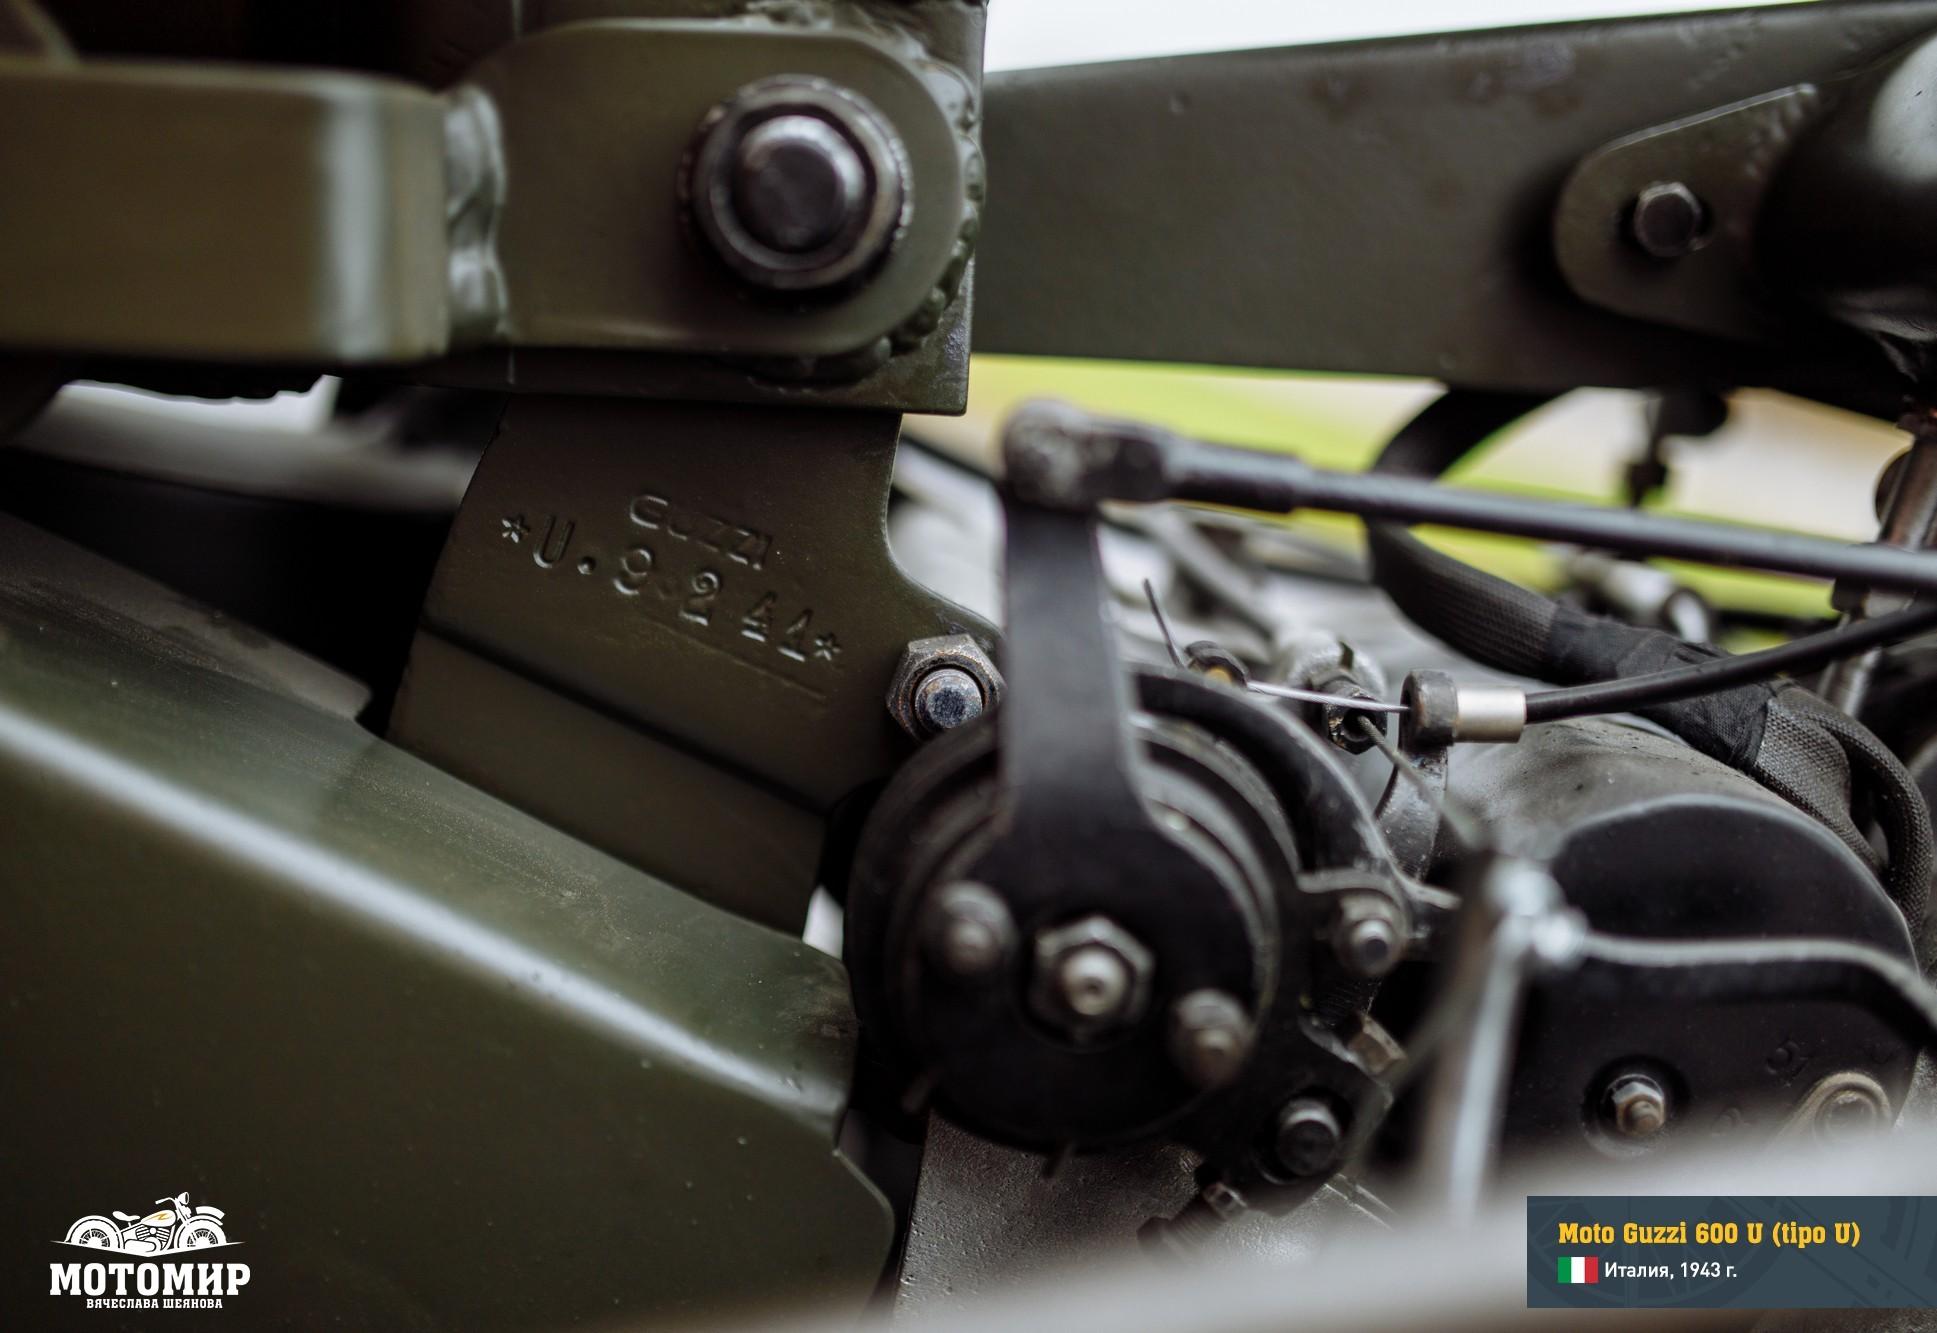 moto-guzzi-600-u-web-45